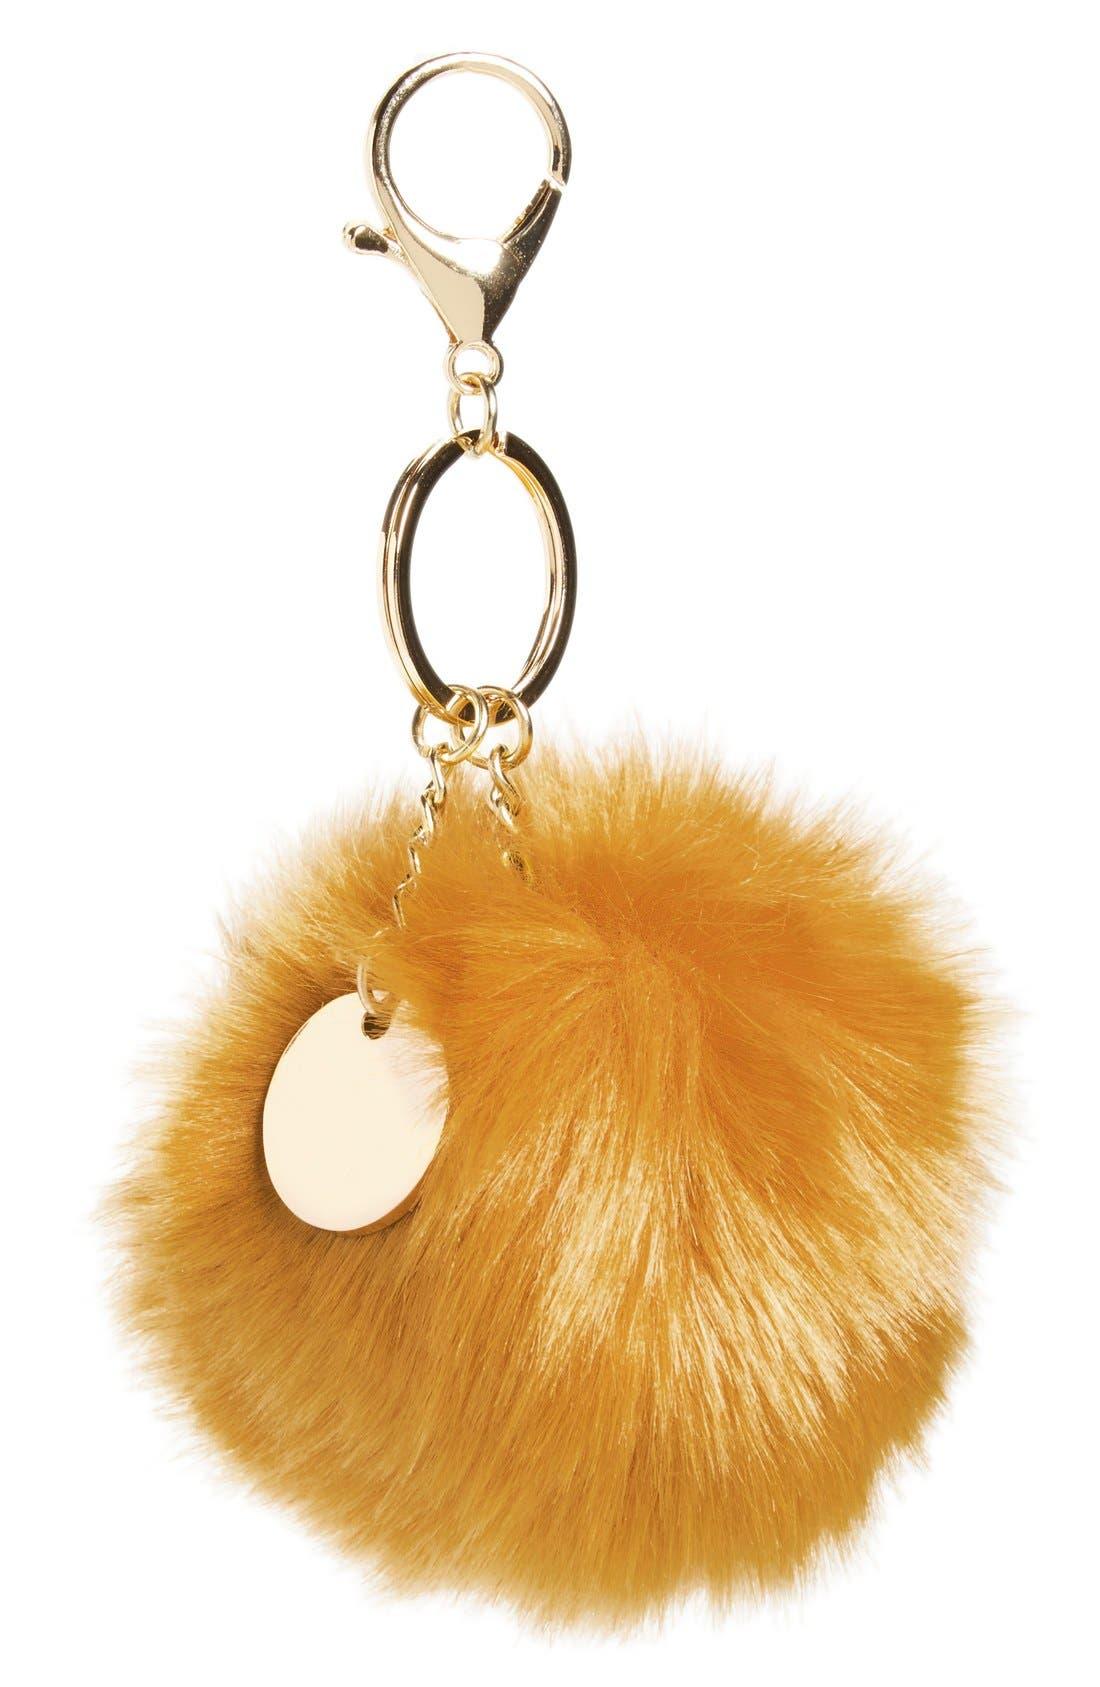 Alternate Image 1 Selected - Topshop Faux Fur Fluffy Bag Charm